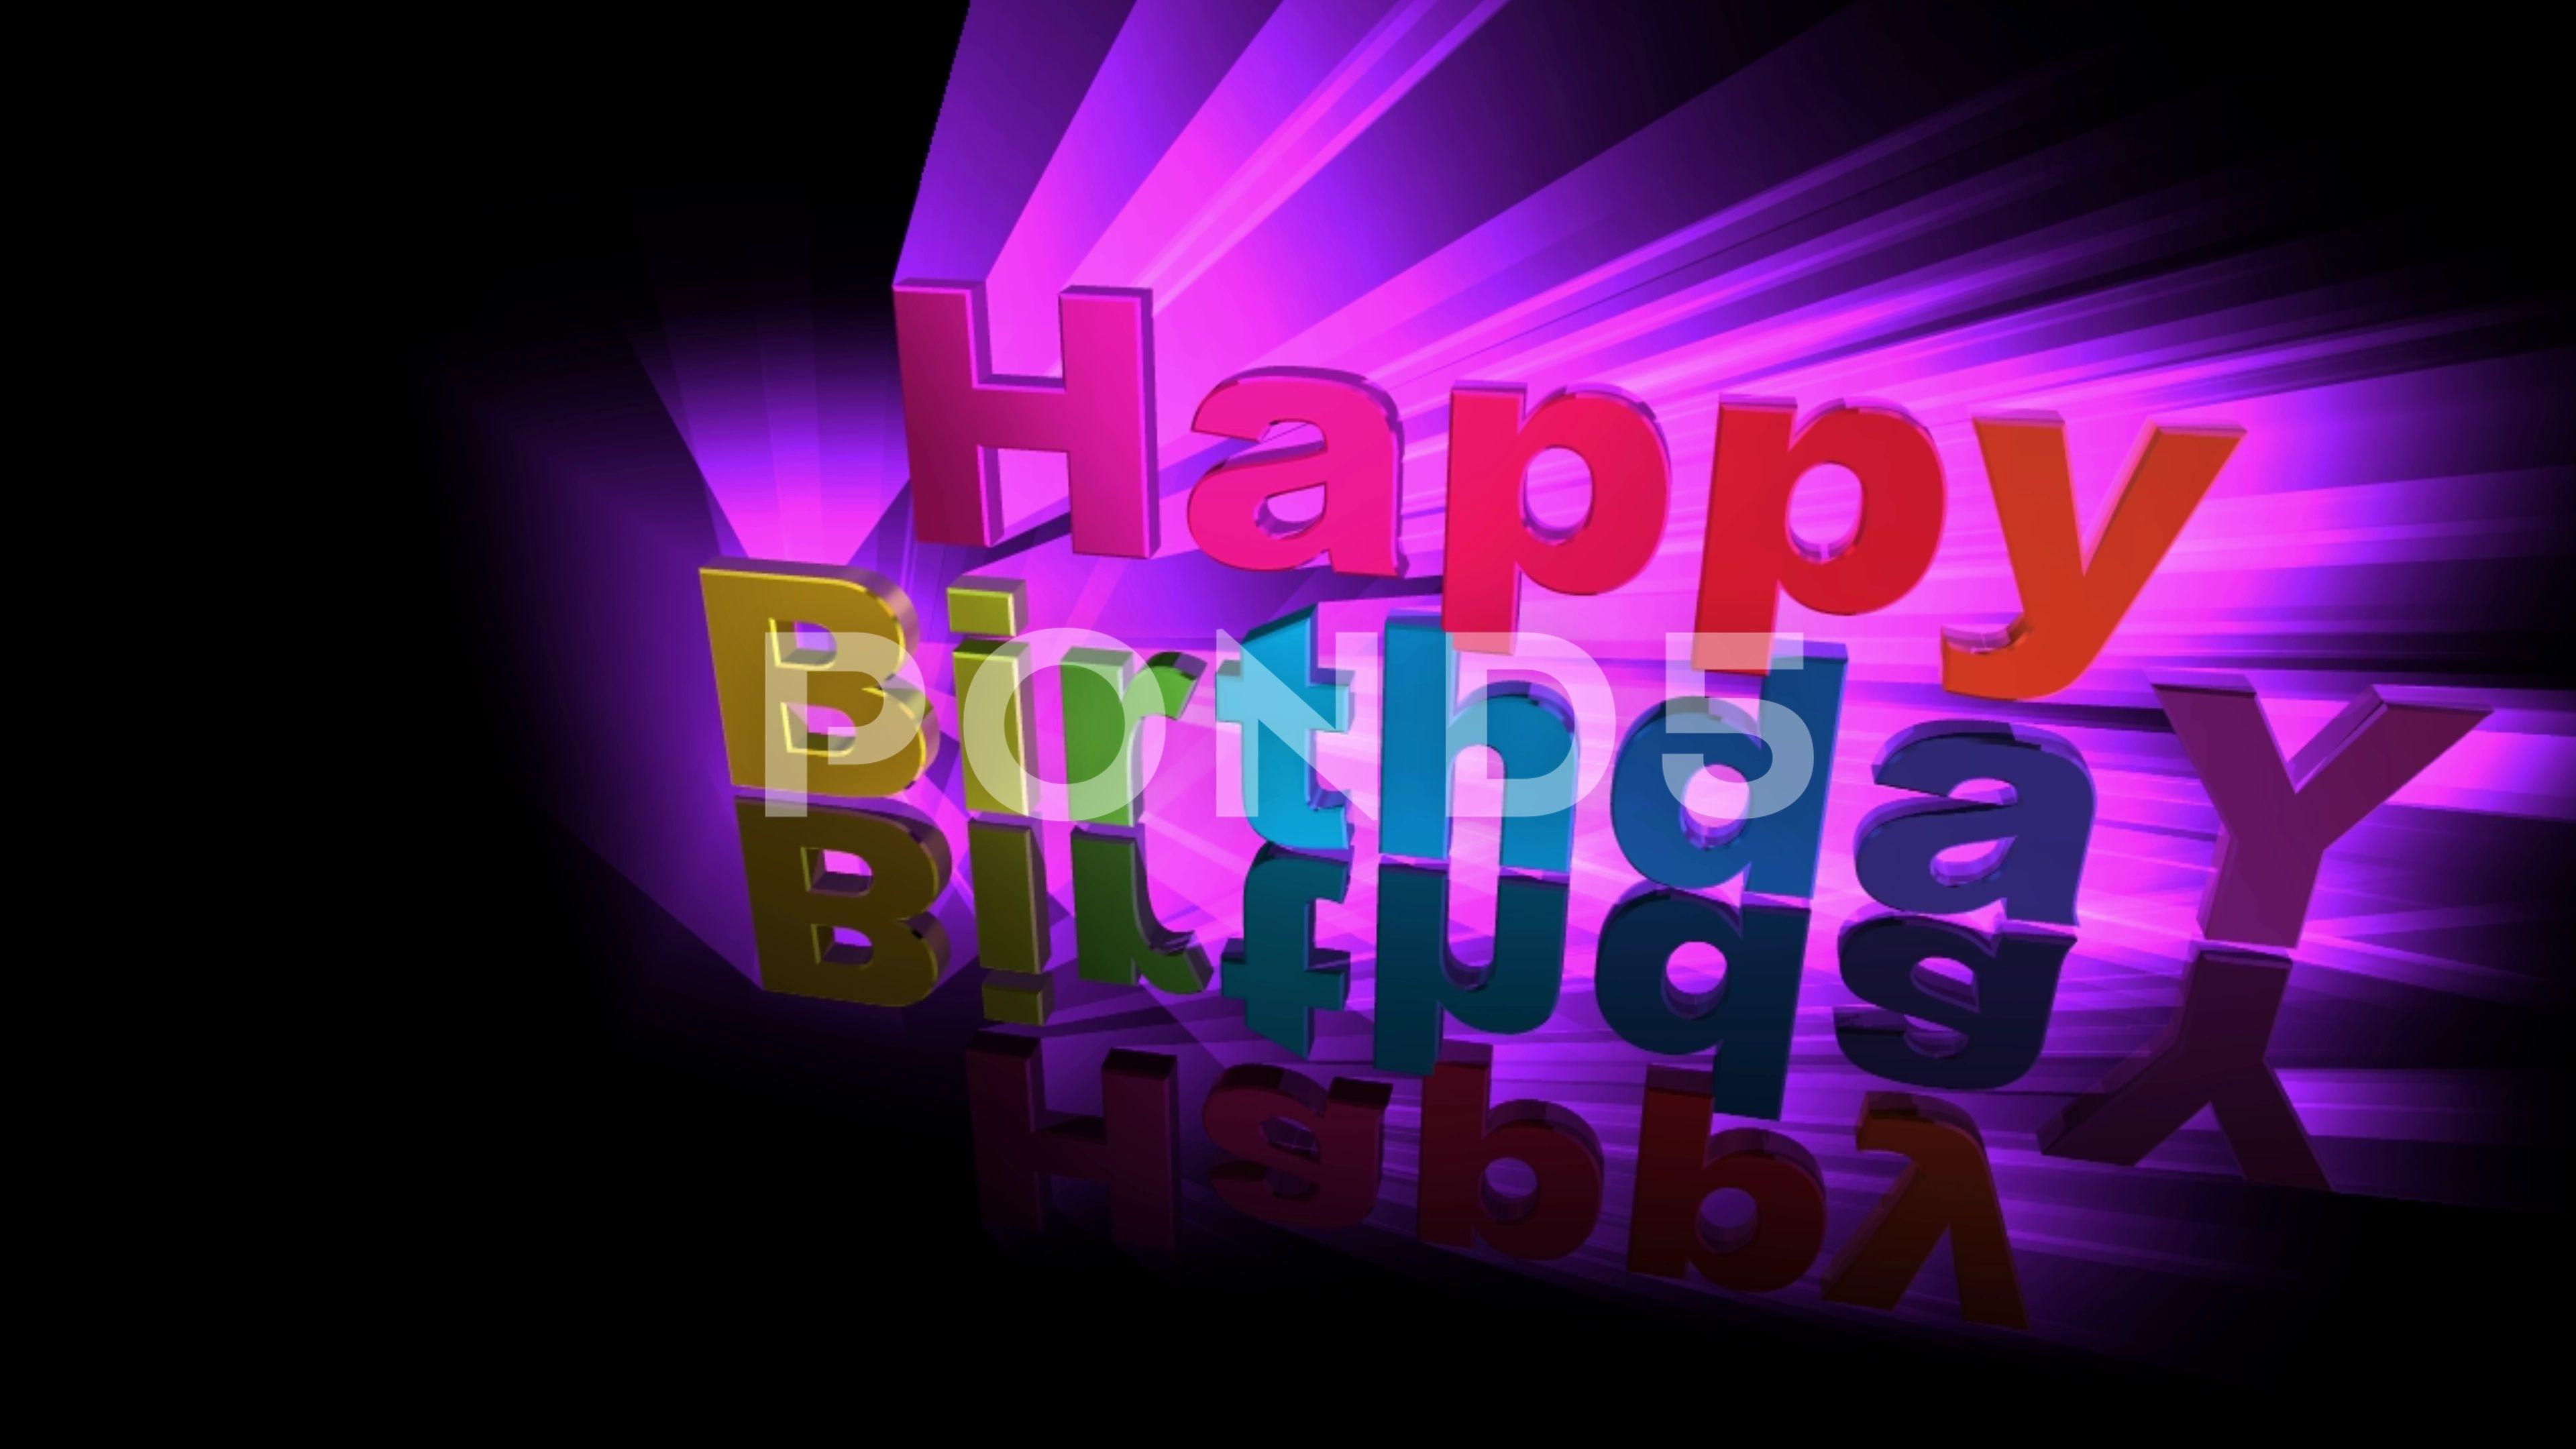 Happy Birthday Title Animation 3d 4k 49 Stock Footage Ad Title Birthday Happy Animation Title Animation Happy Birthday Birthday Diy